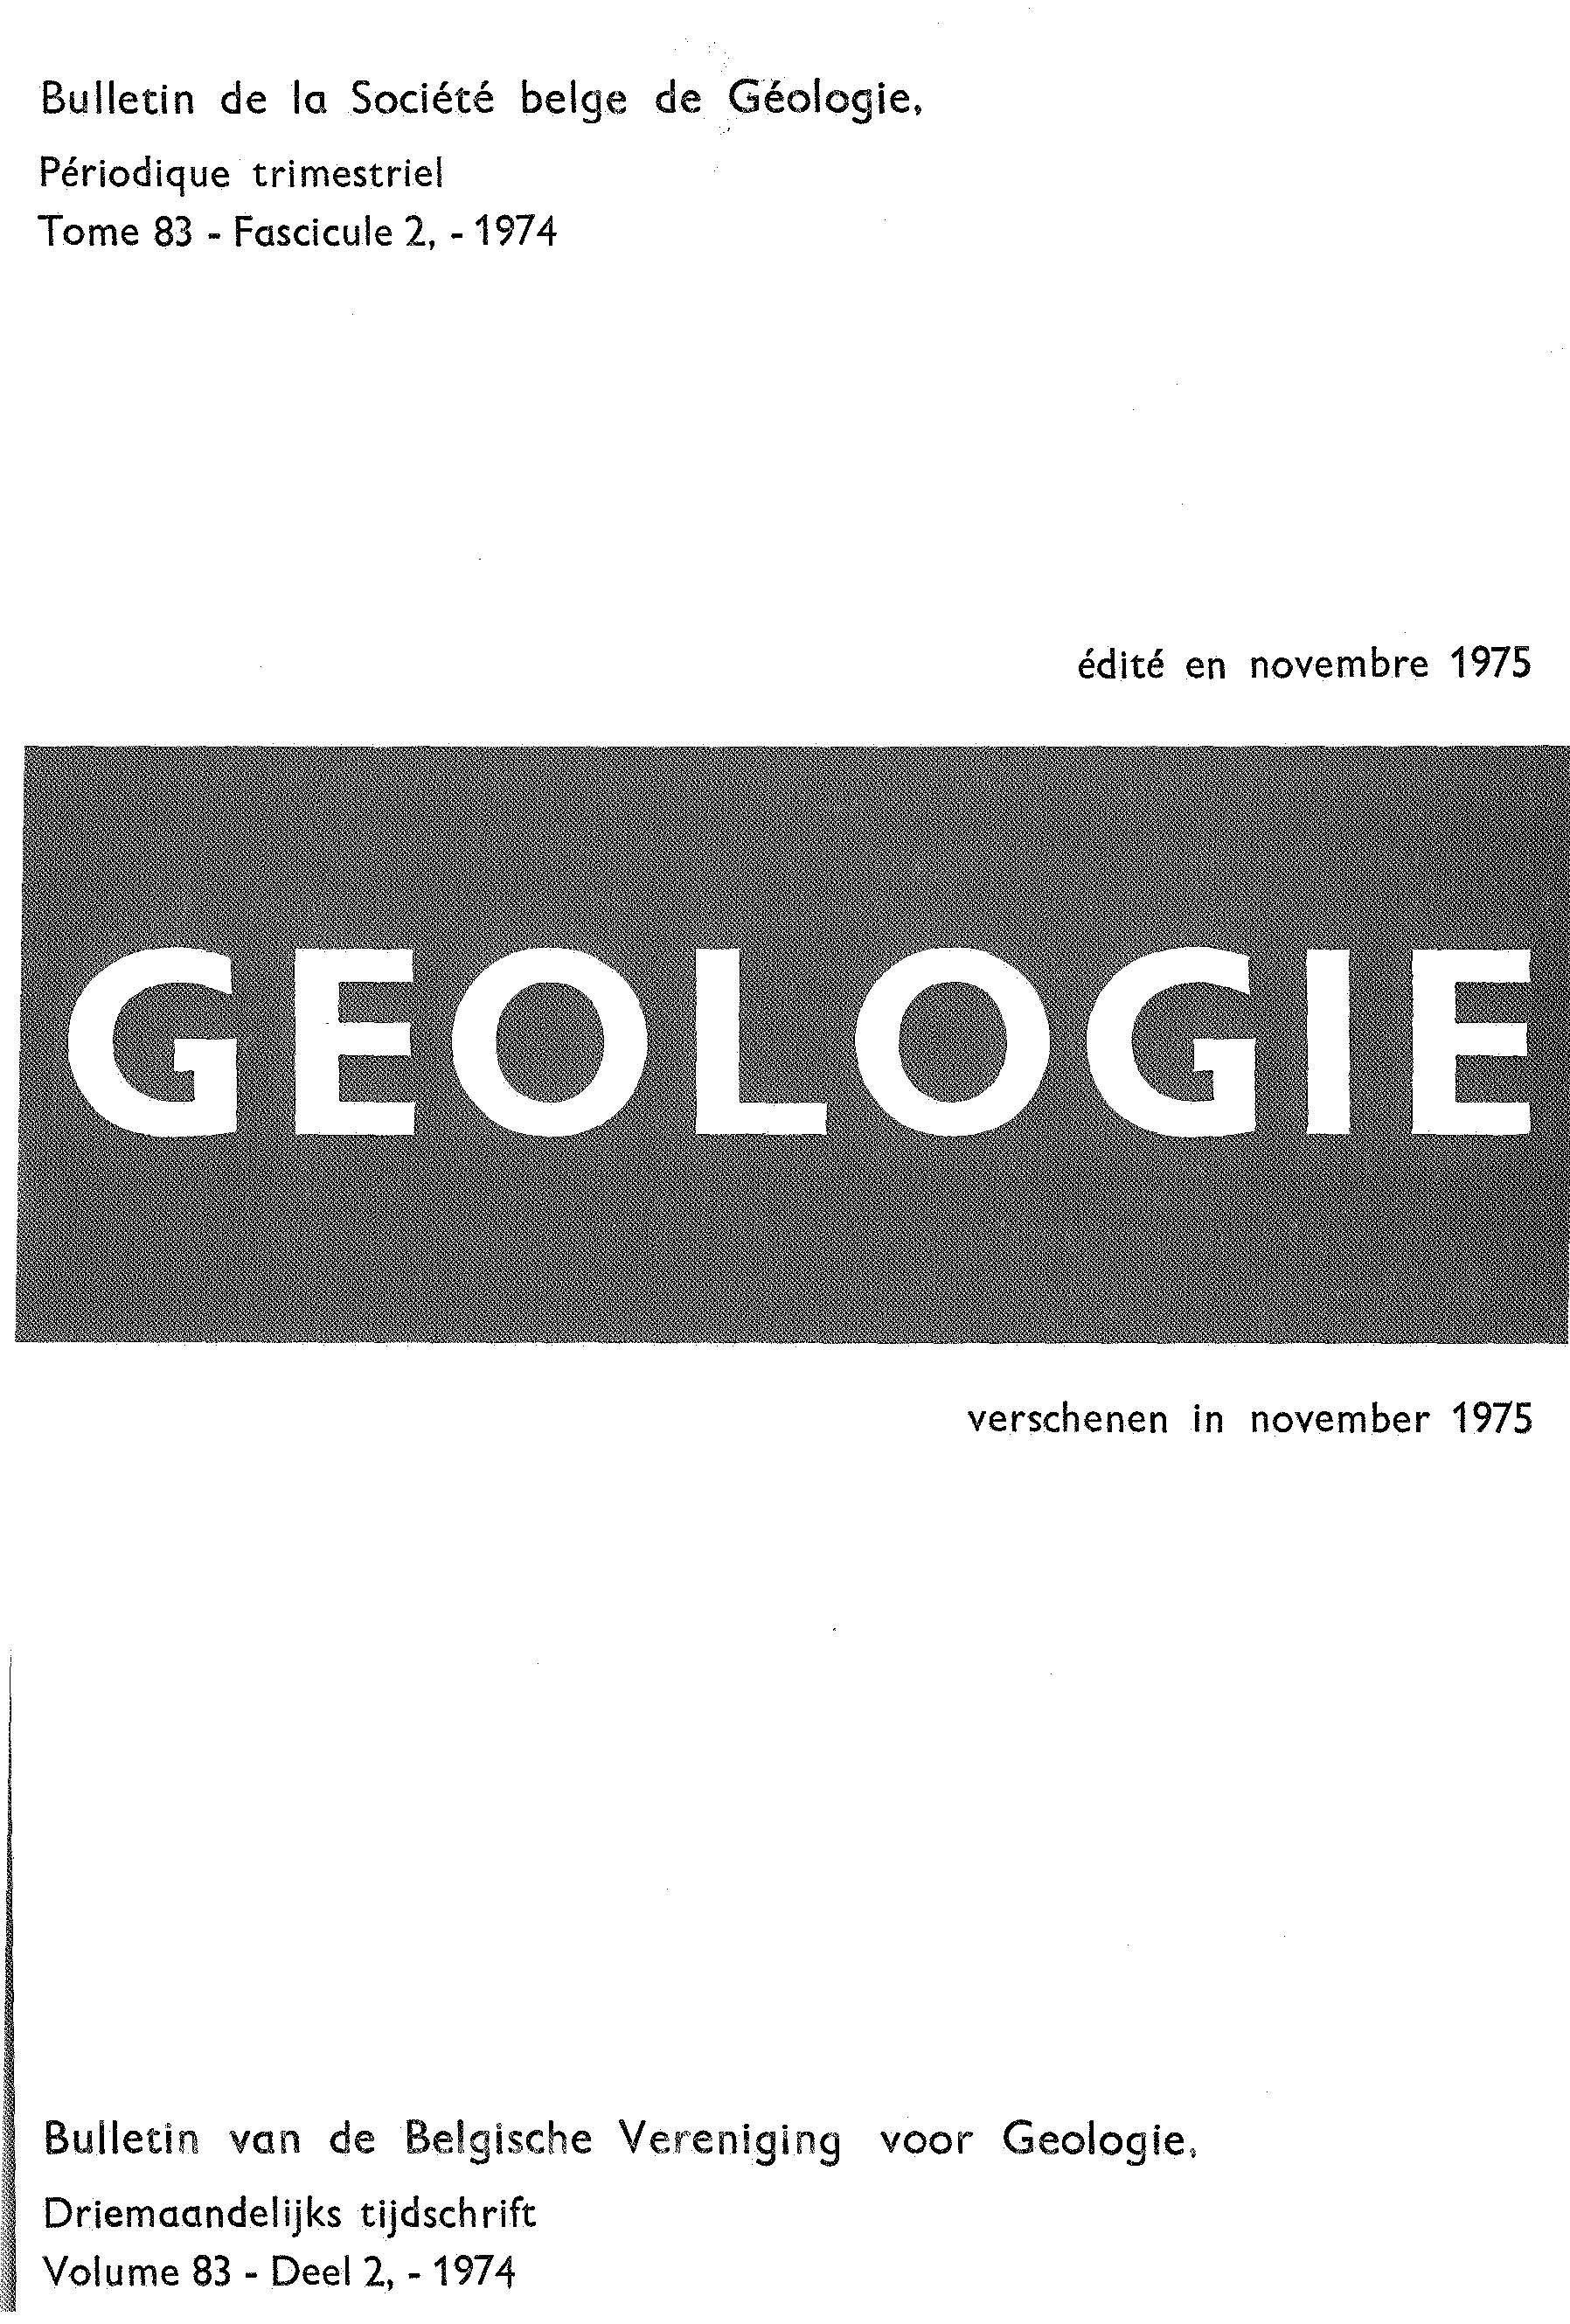 BSBG_83_1974_cover2.jpg